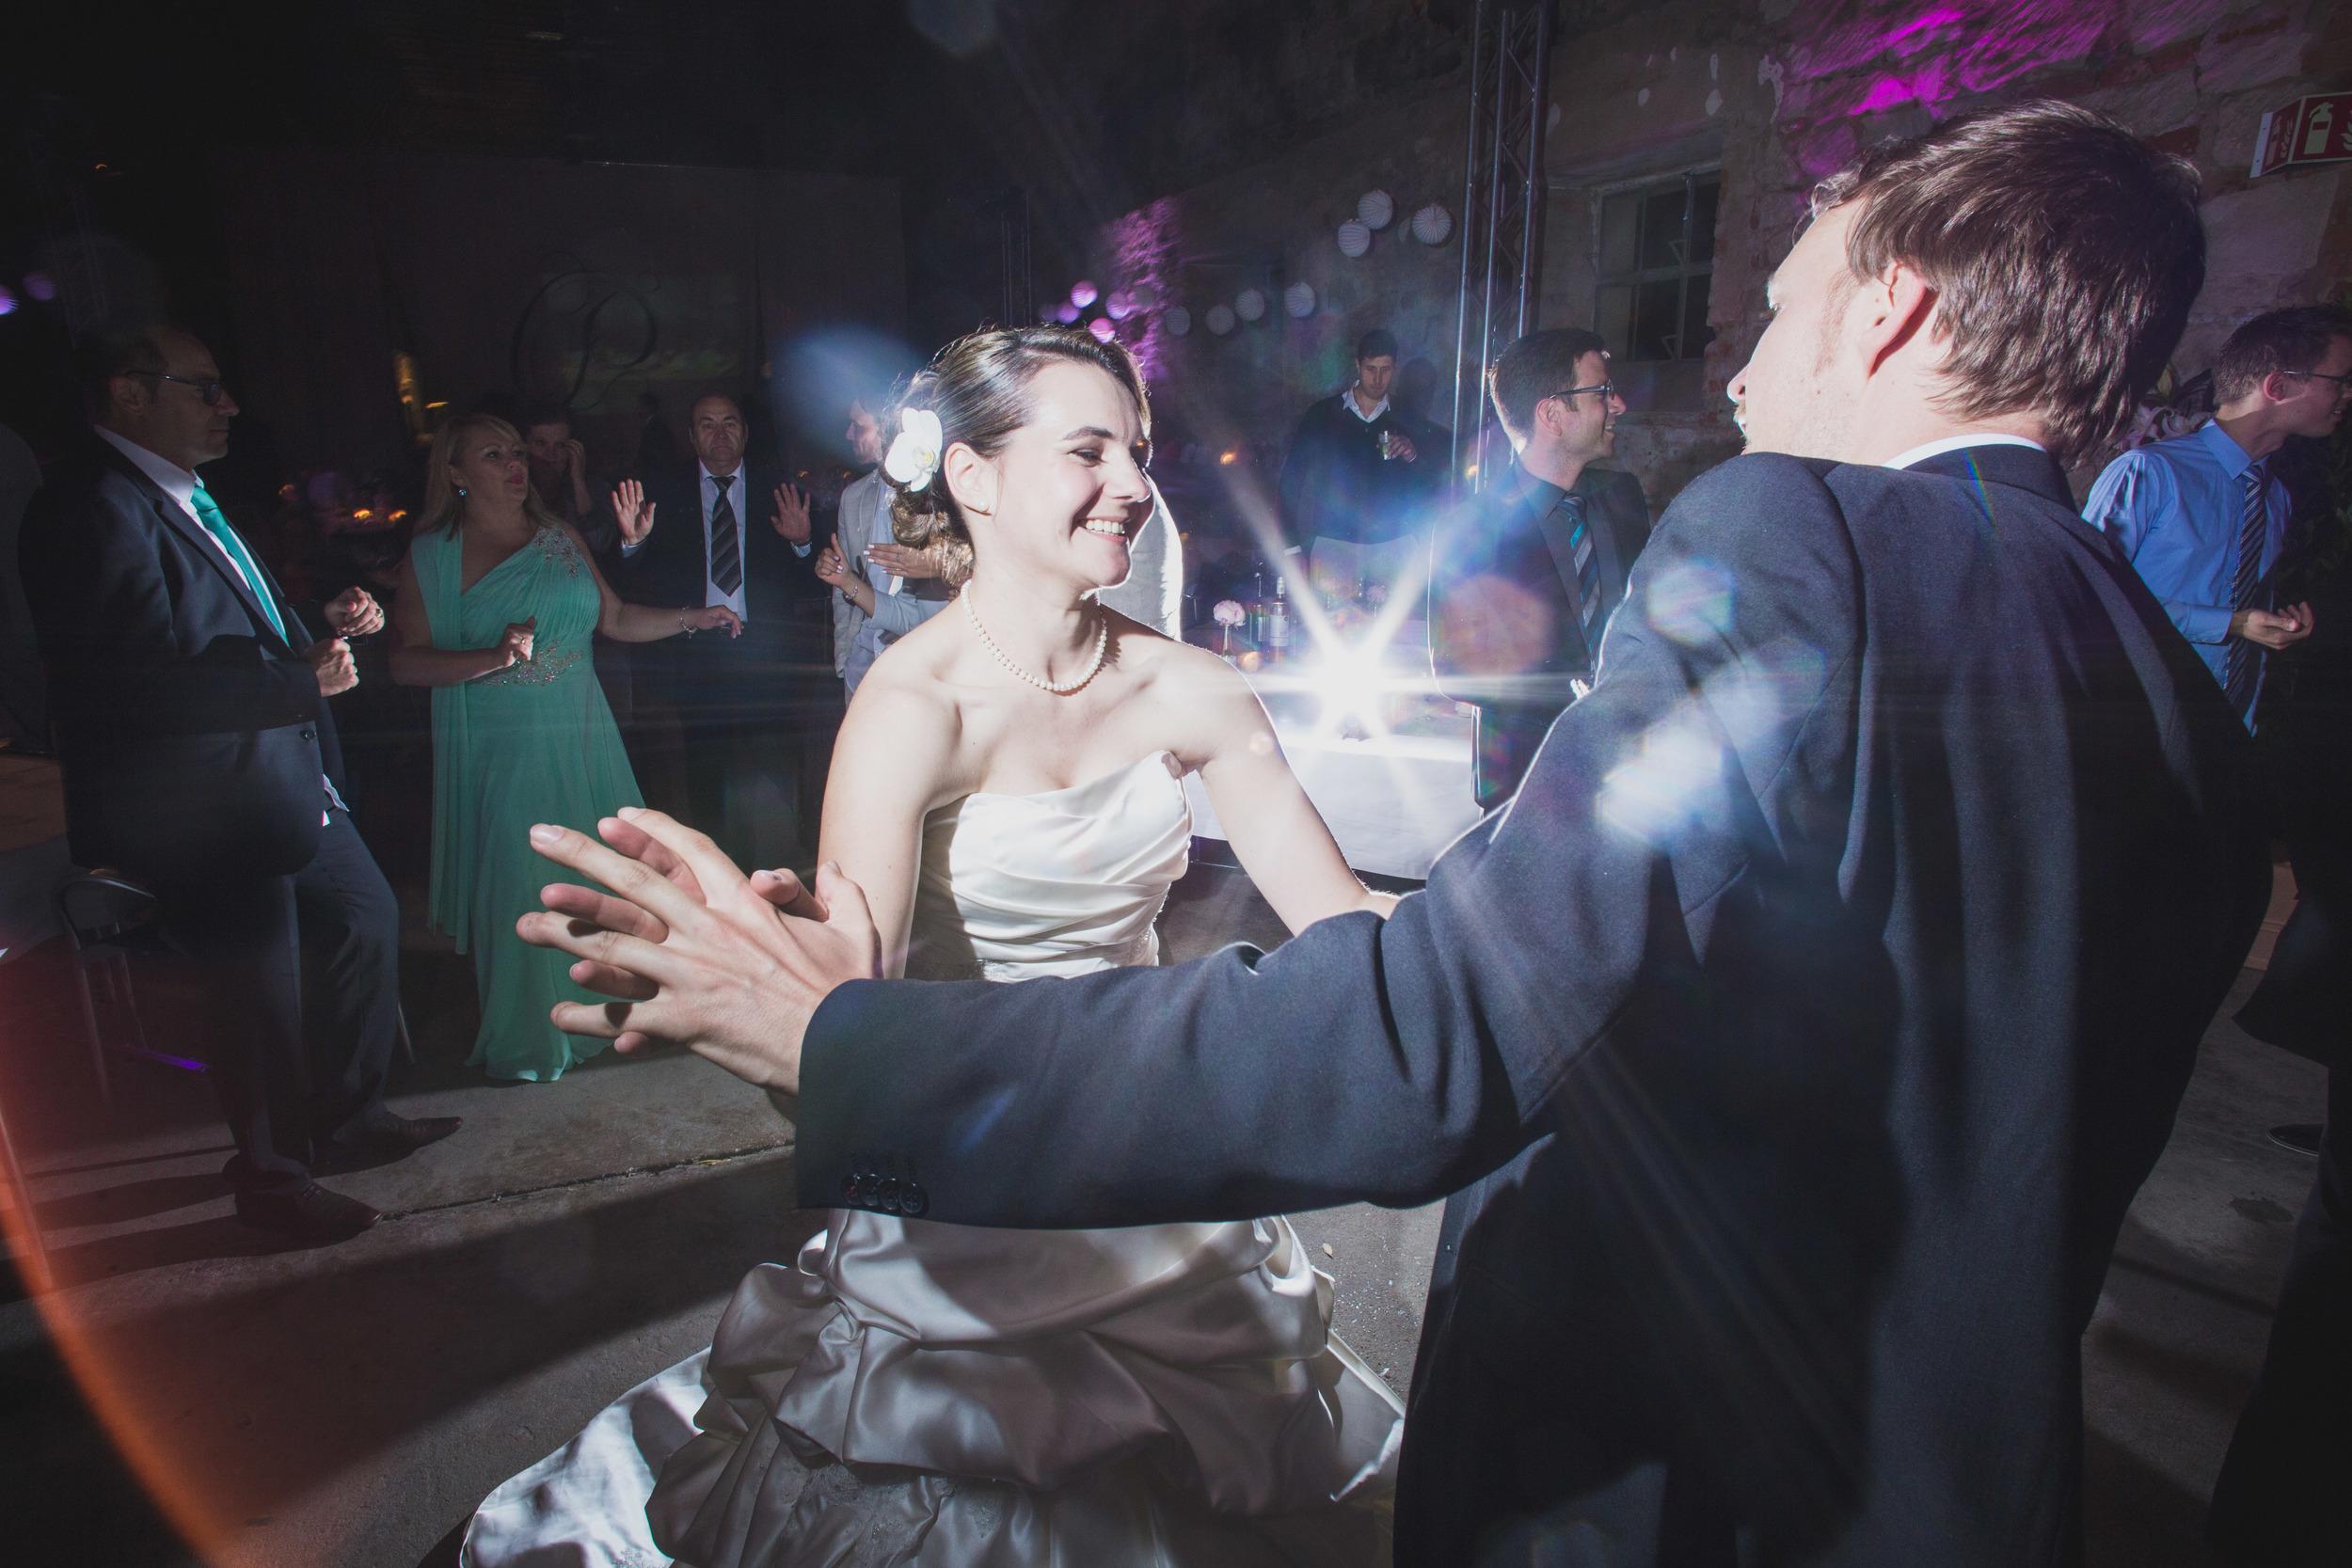 Pauline-Und-Christoph-Buffalo-NY-Wedding-by-Stefan-Ludwig-Photography-536.jpg